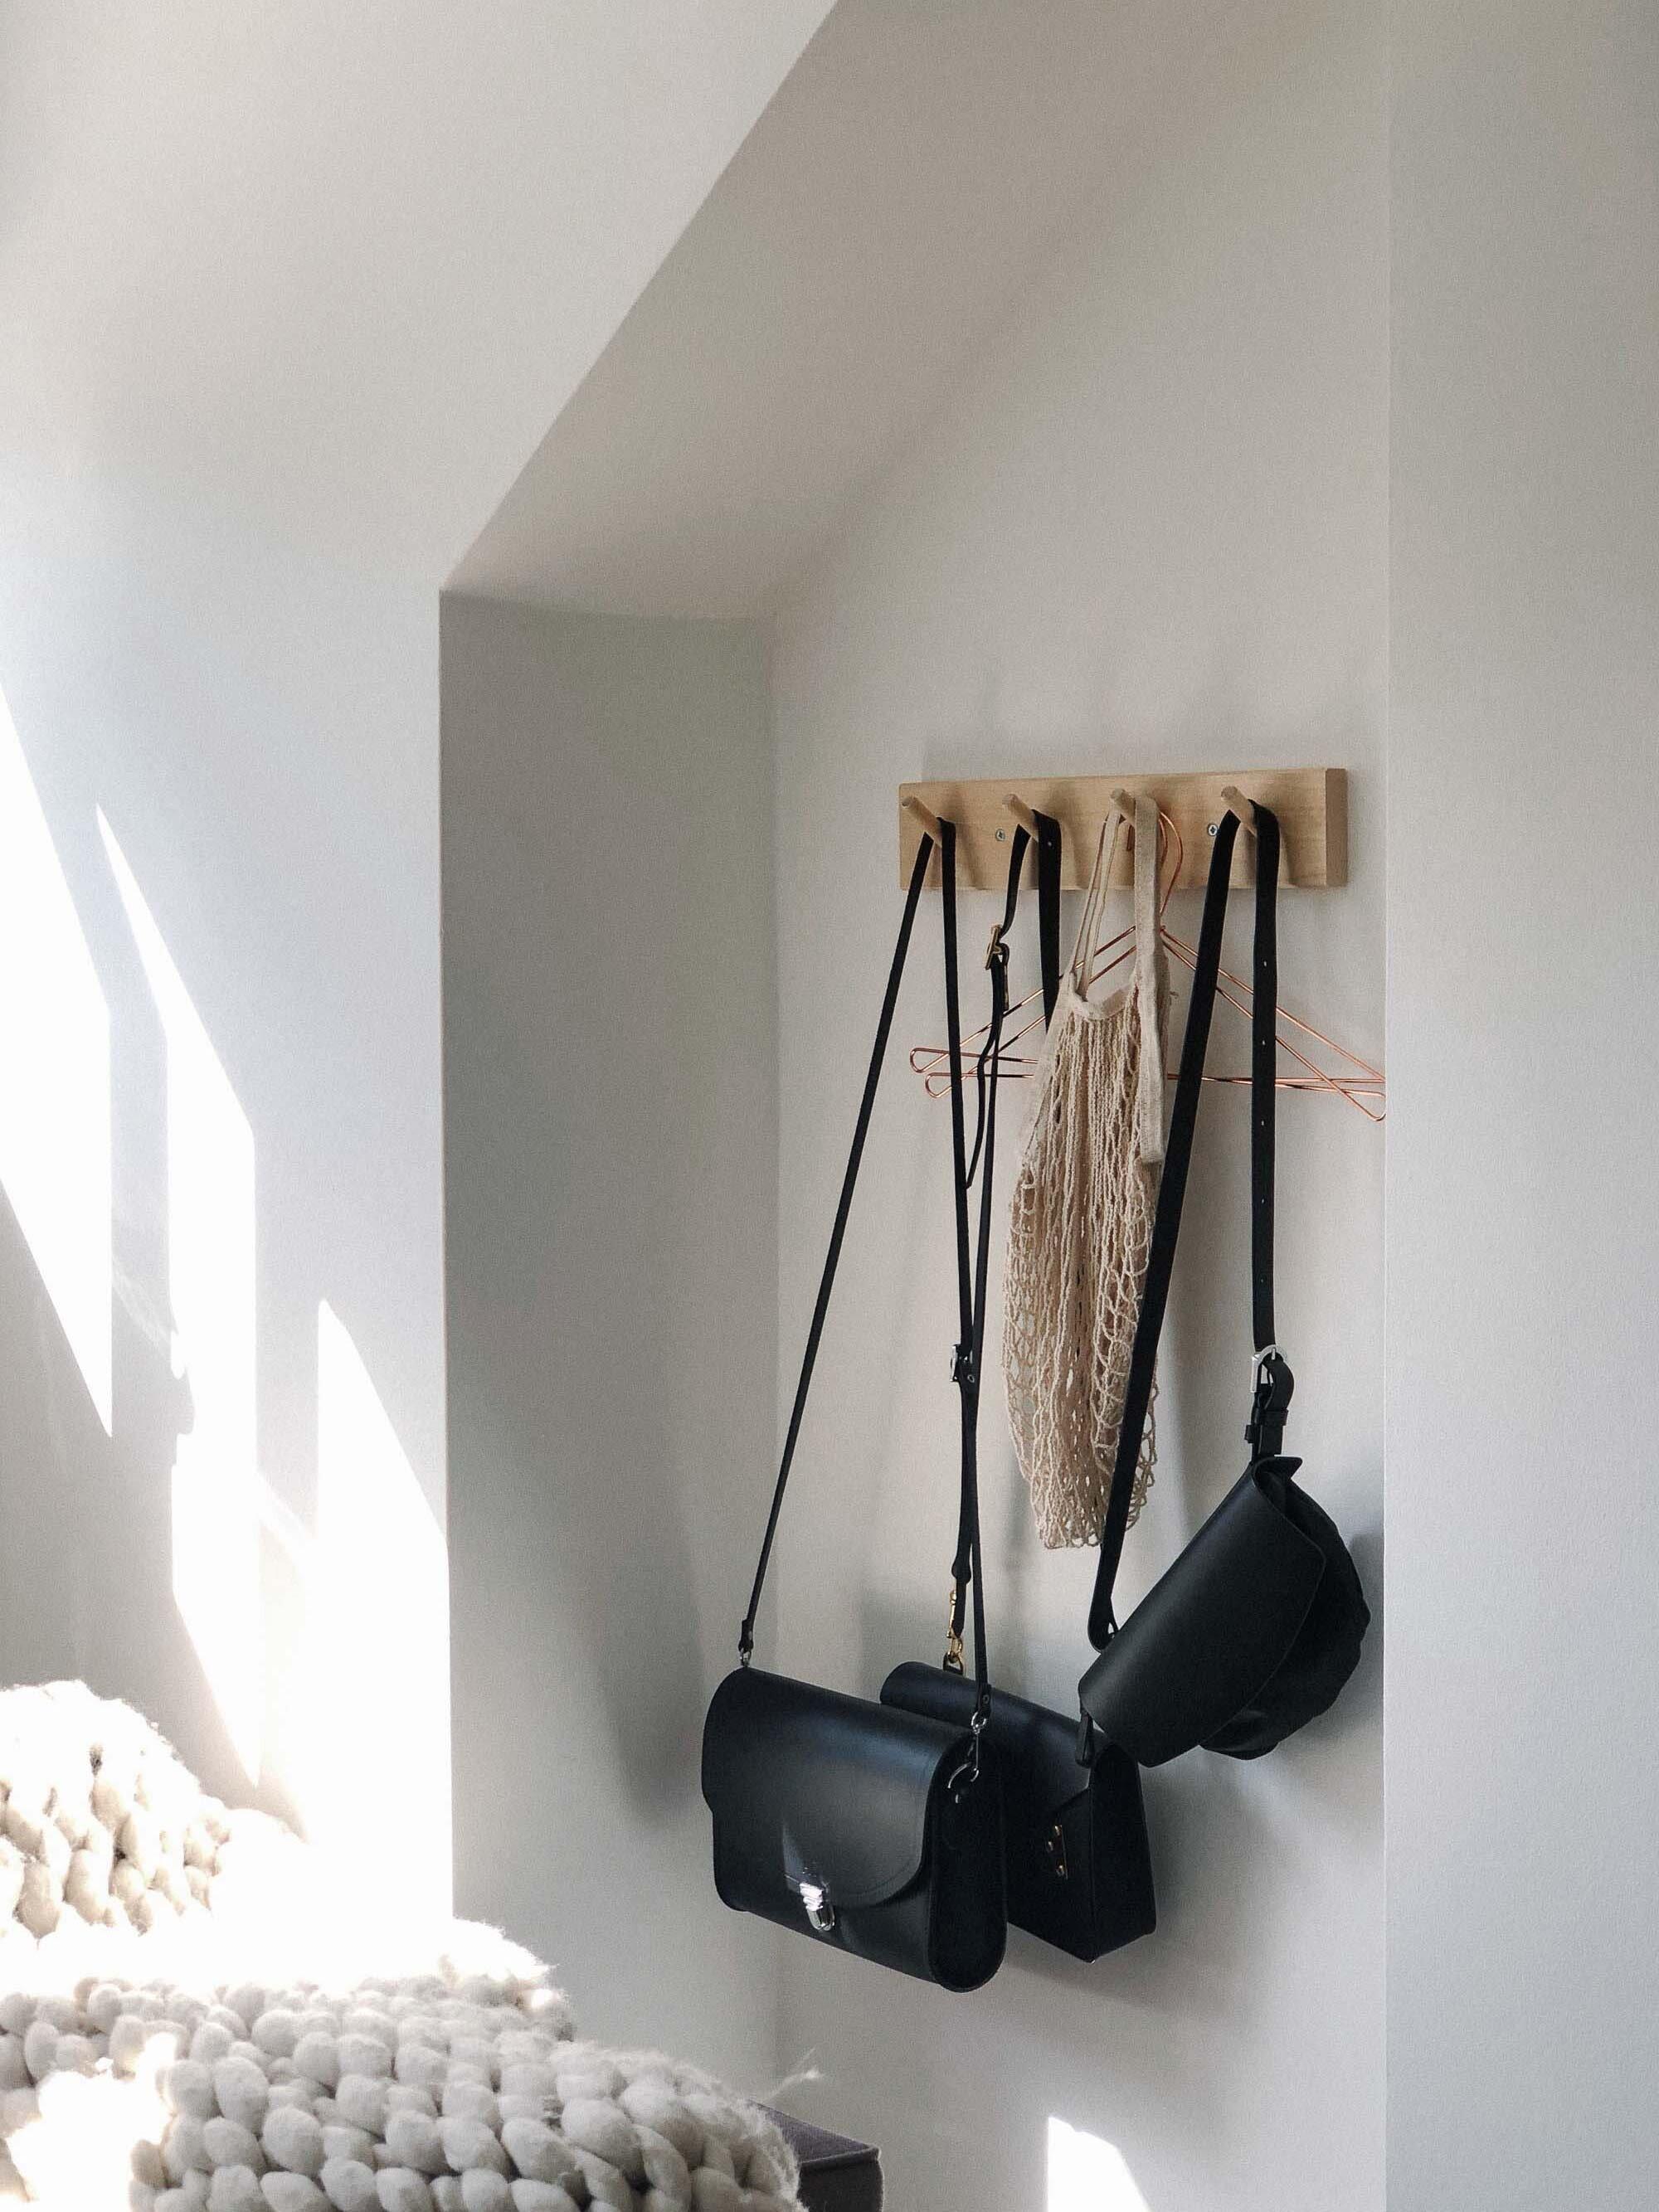 6-hanging-bag-storage-on-ARKET-hooks.jpg